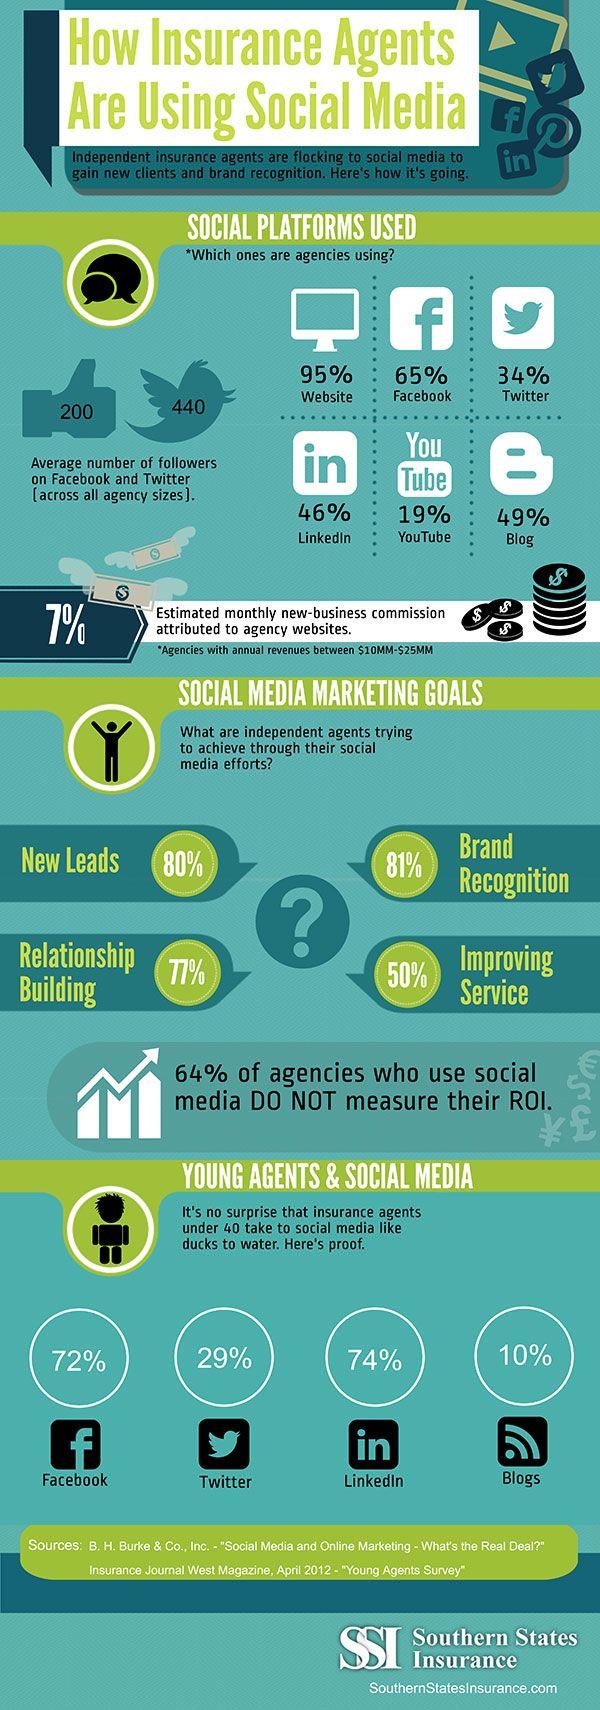 How Insurance Agents Are Using Social Media Infographic Life Insurance Marketing Insurance Agent Insurance Marketing